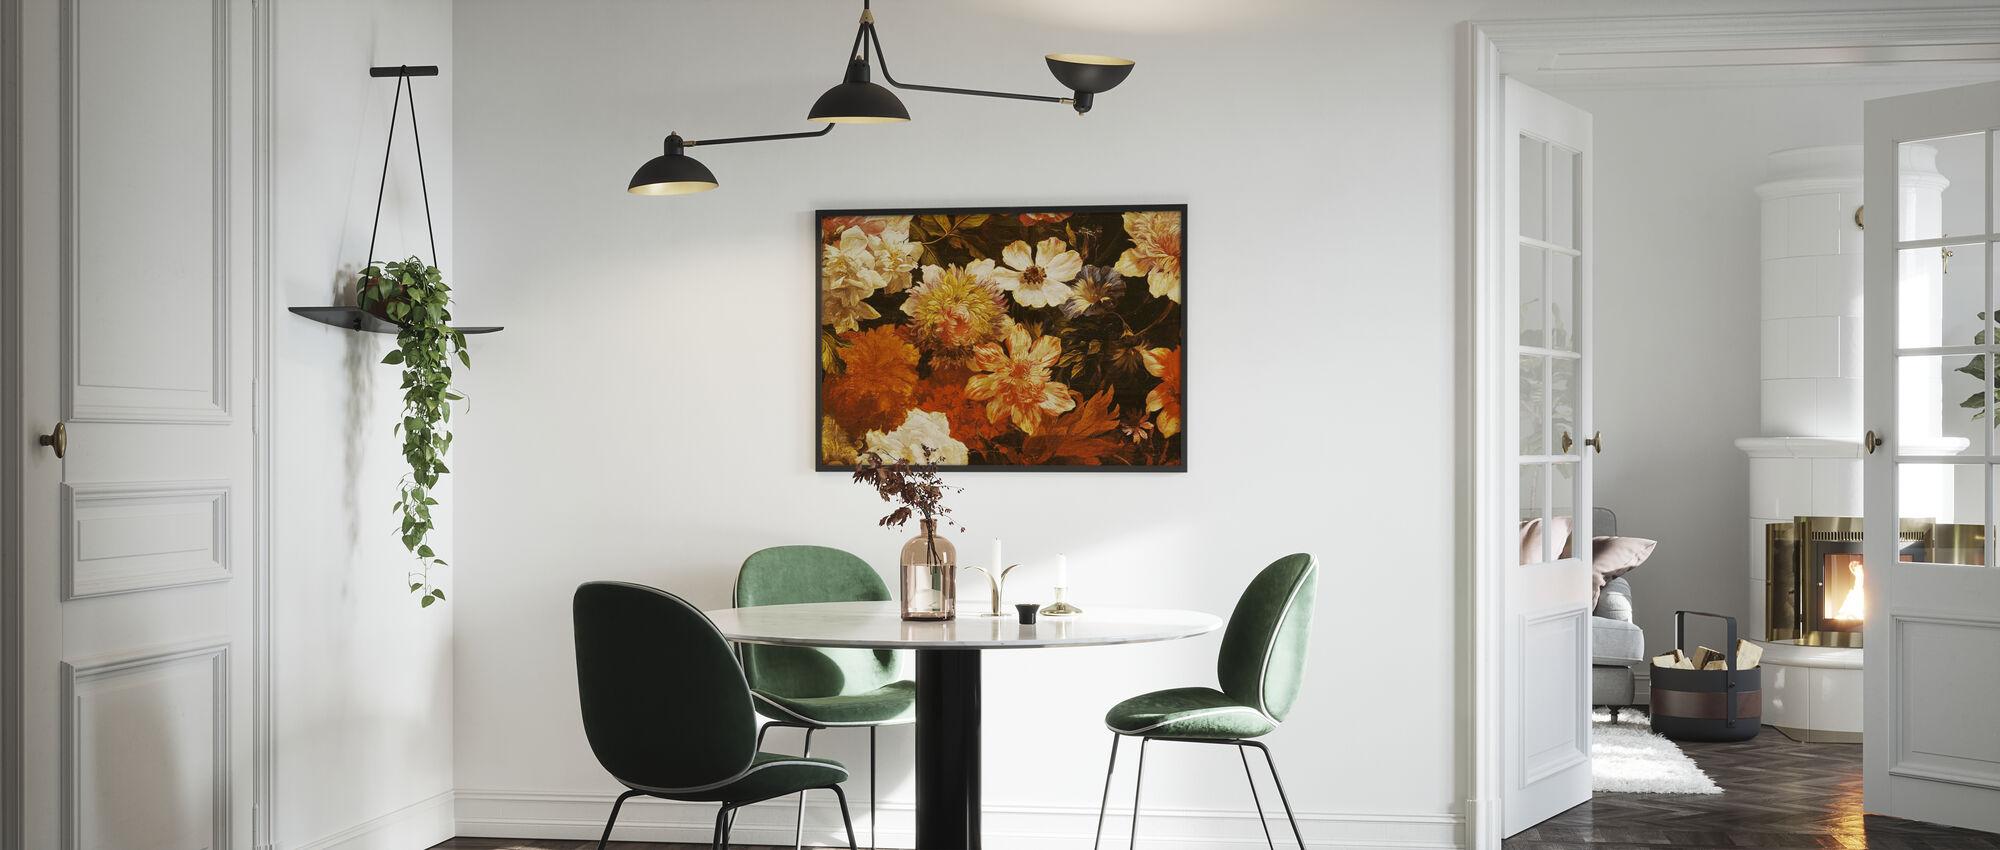 Detail of Flowers - Michelangelo Cerquozzi - Framed print - Kitchen